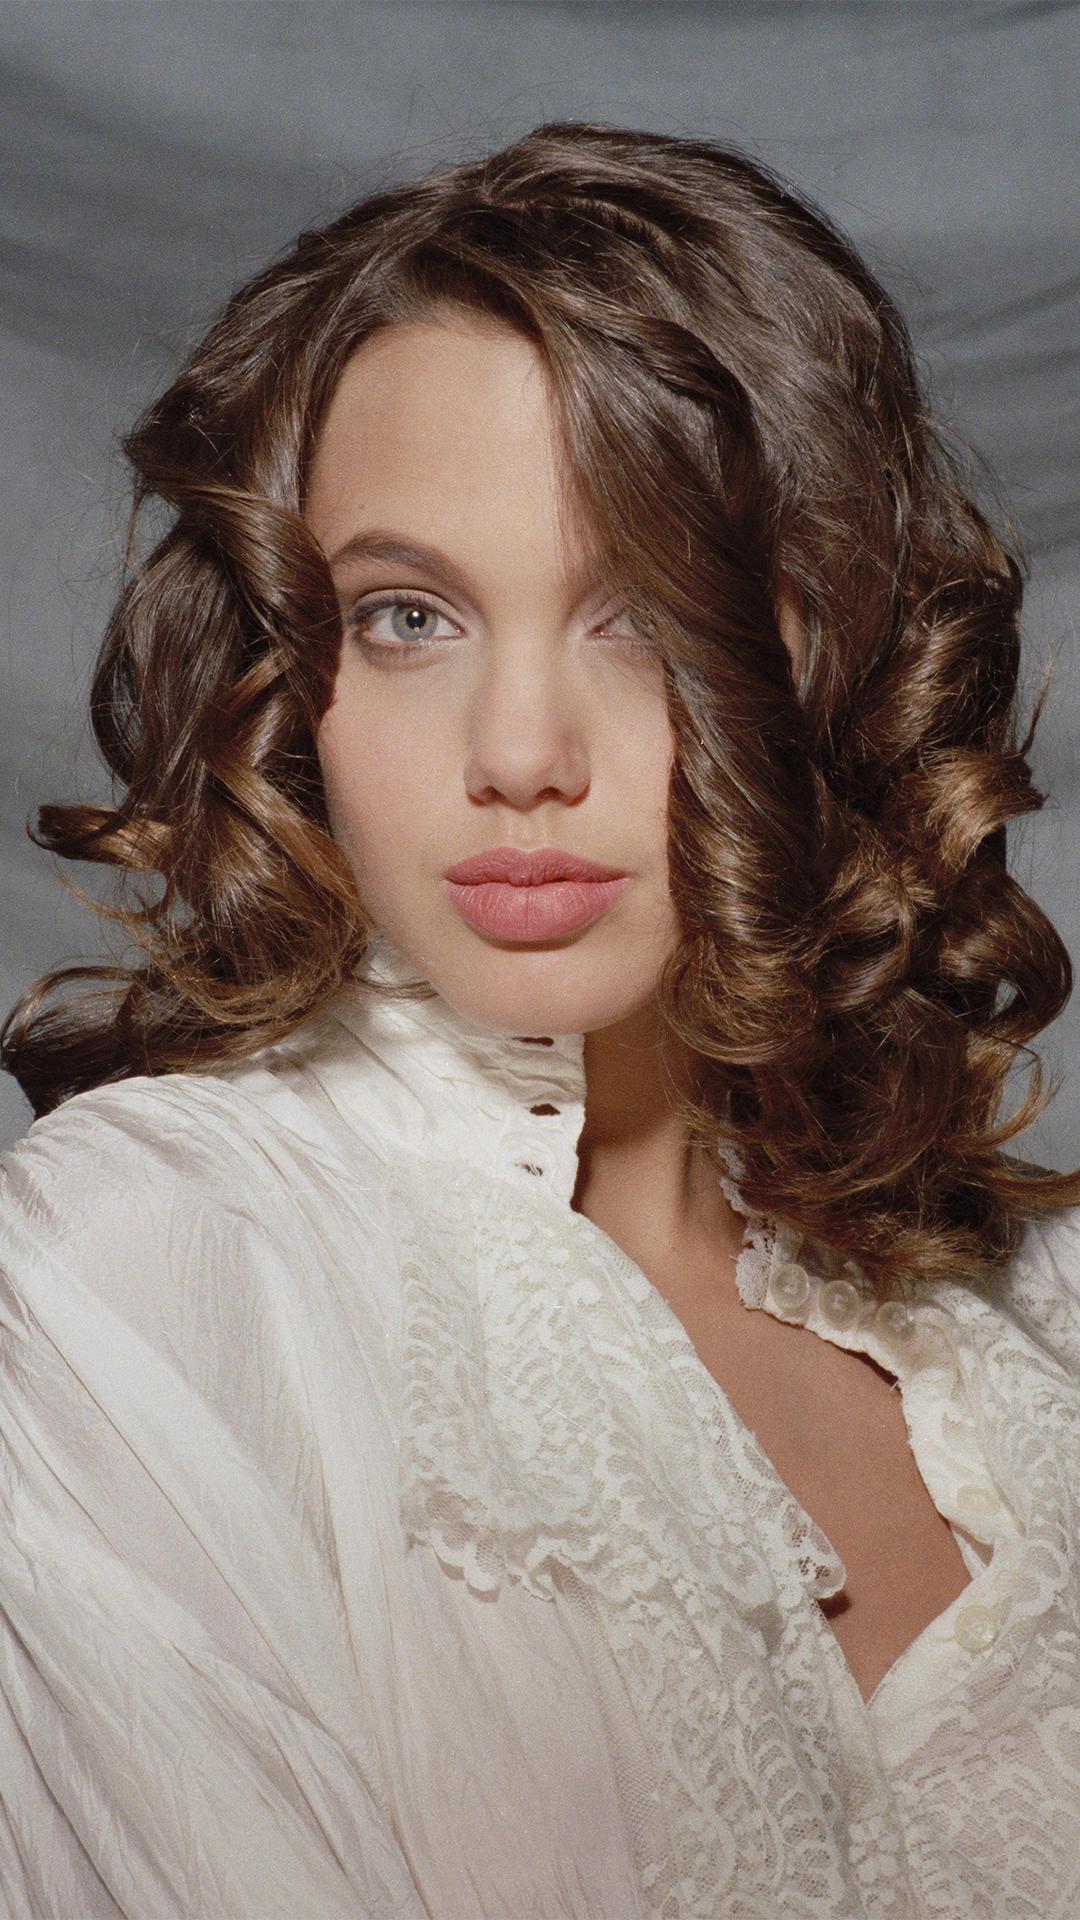 Angelina Jolie antes de ser famosa - Pelando El Ojo Angelina Jolie